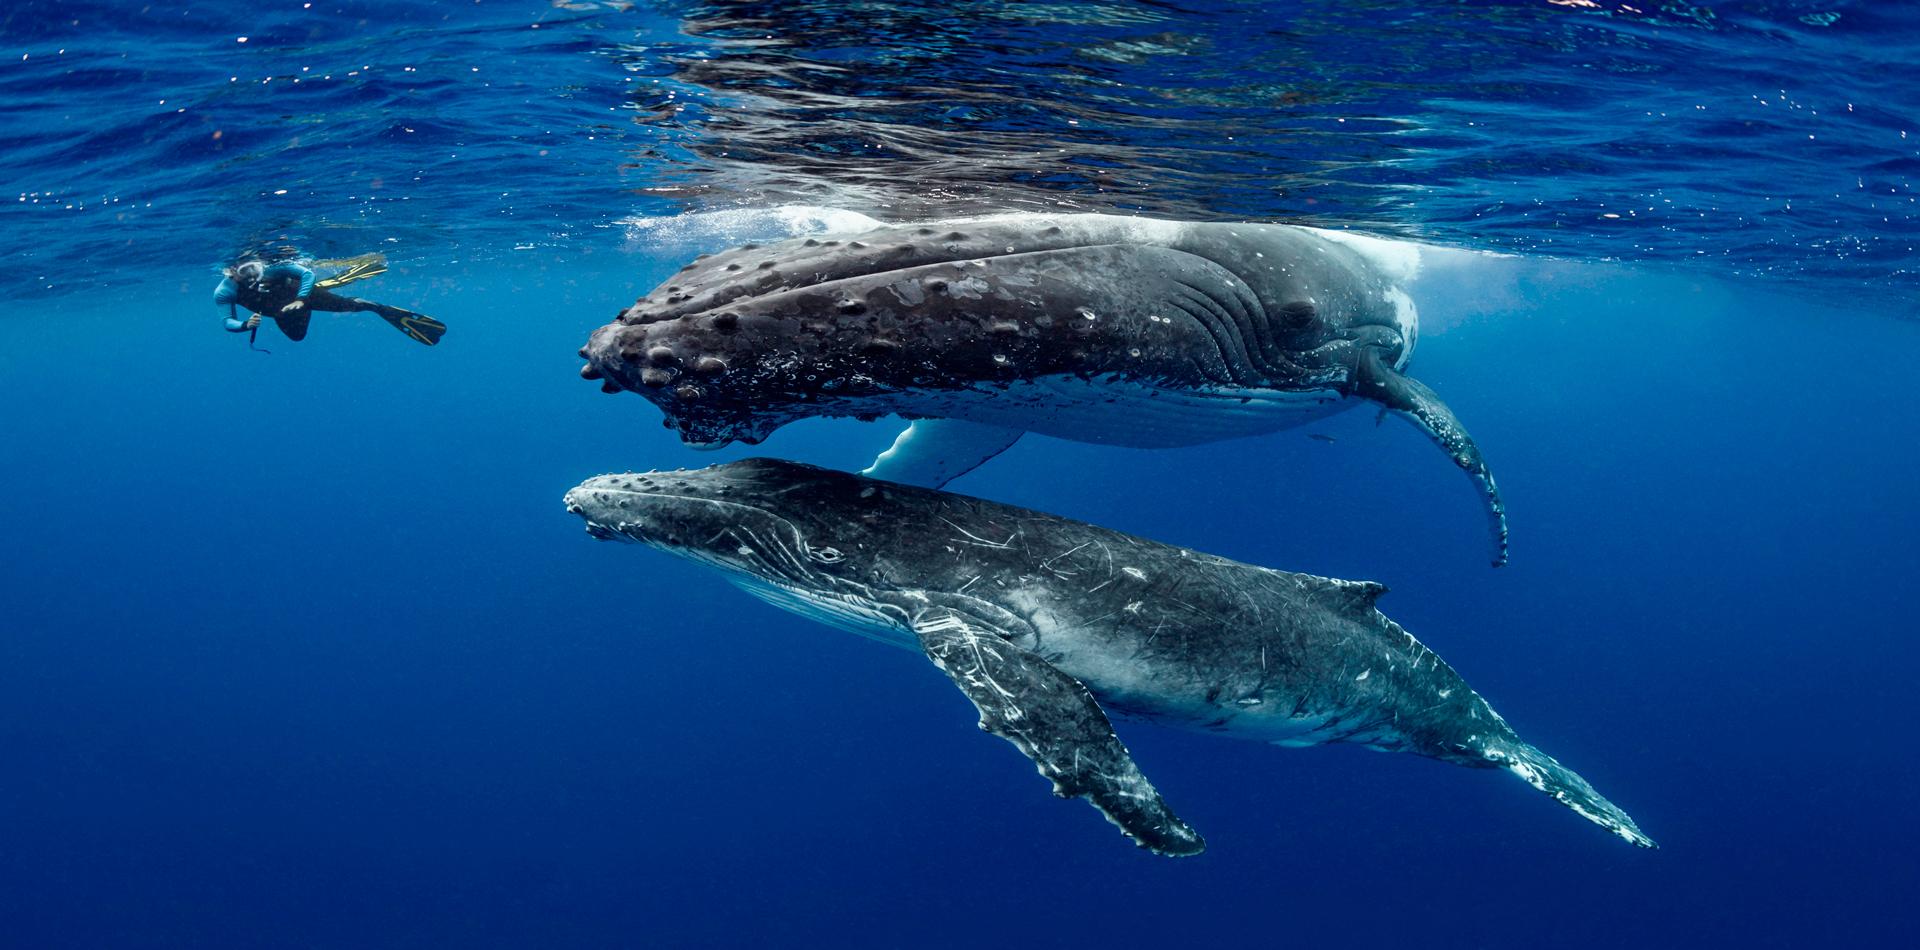 humpback whales snorkelling underwater